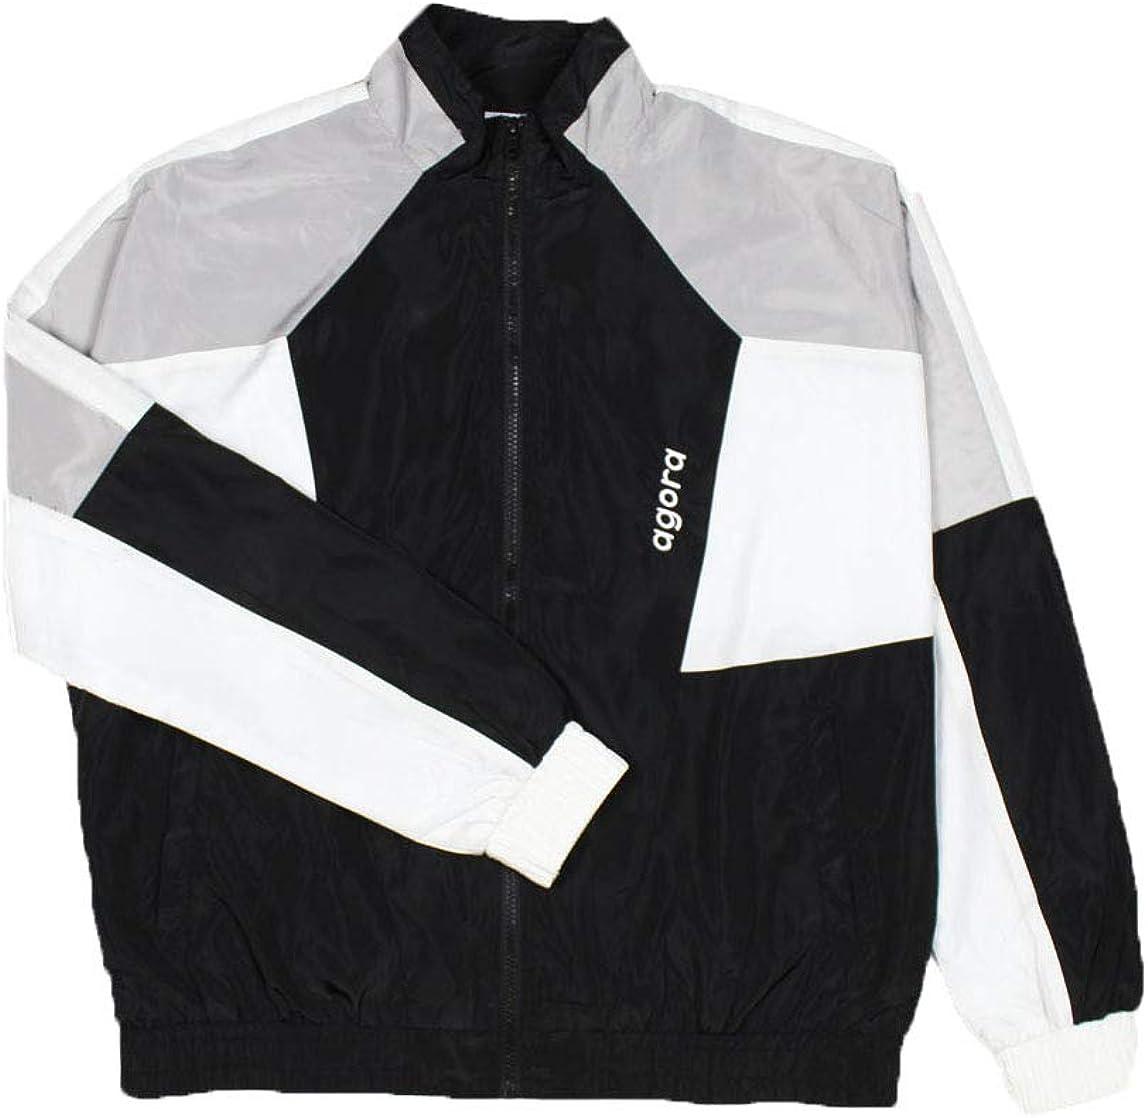 AGORA Vanquish Max 44% OFF Jacket Windbreaker NEW before selling ☆